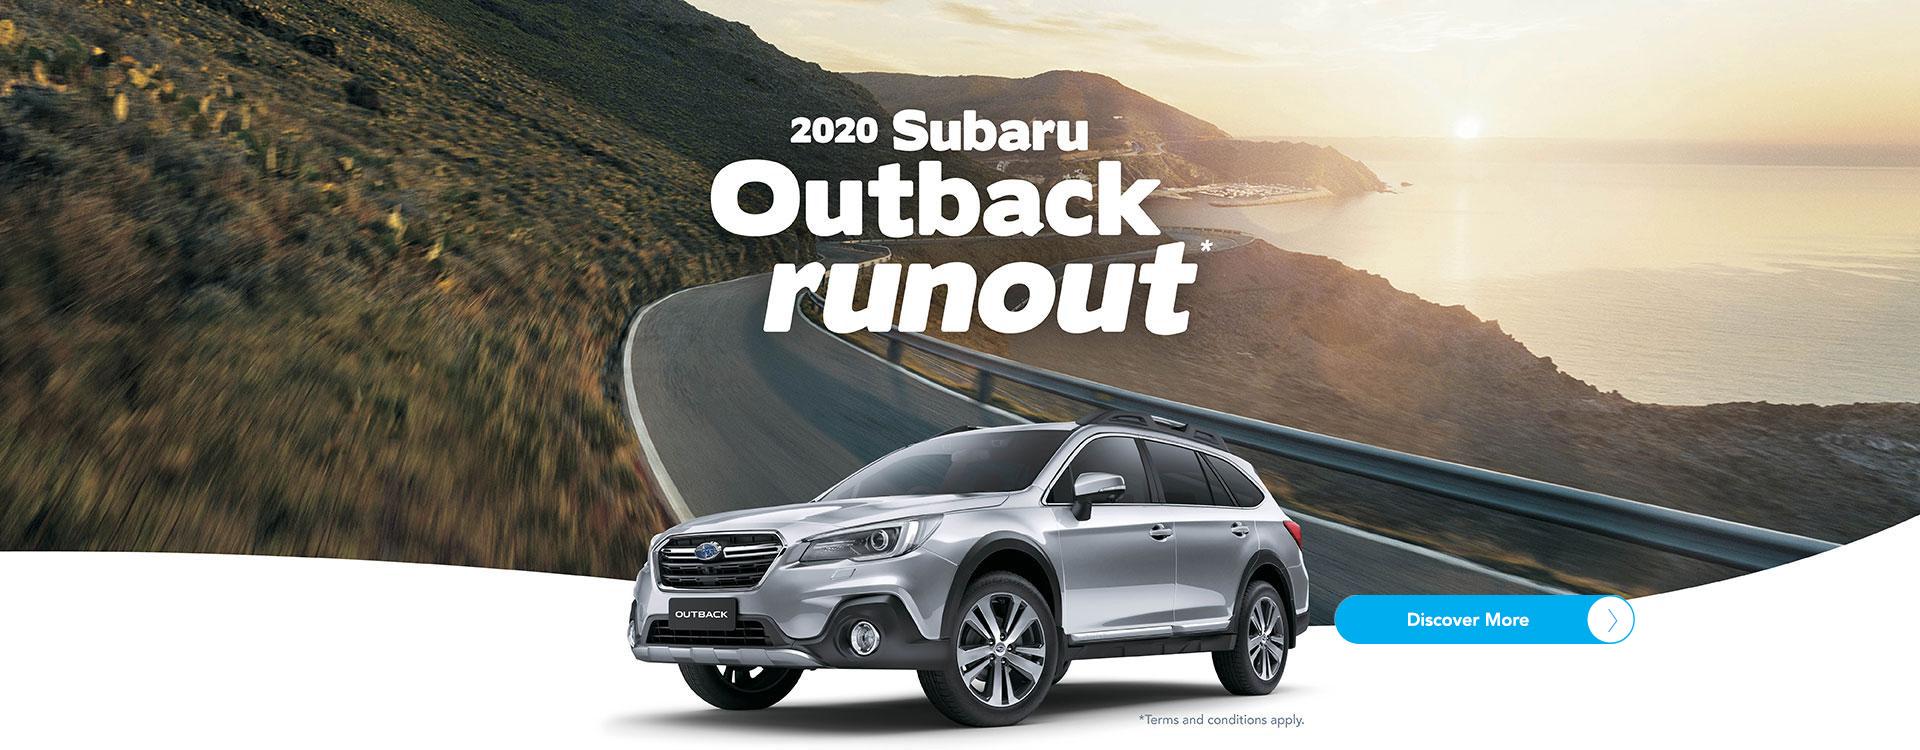 Subaru offers